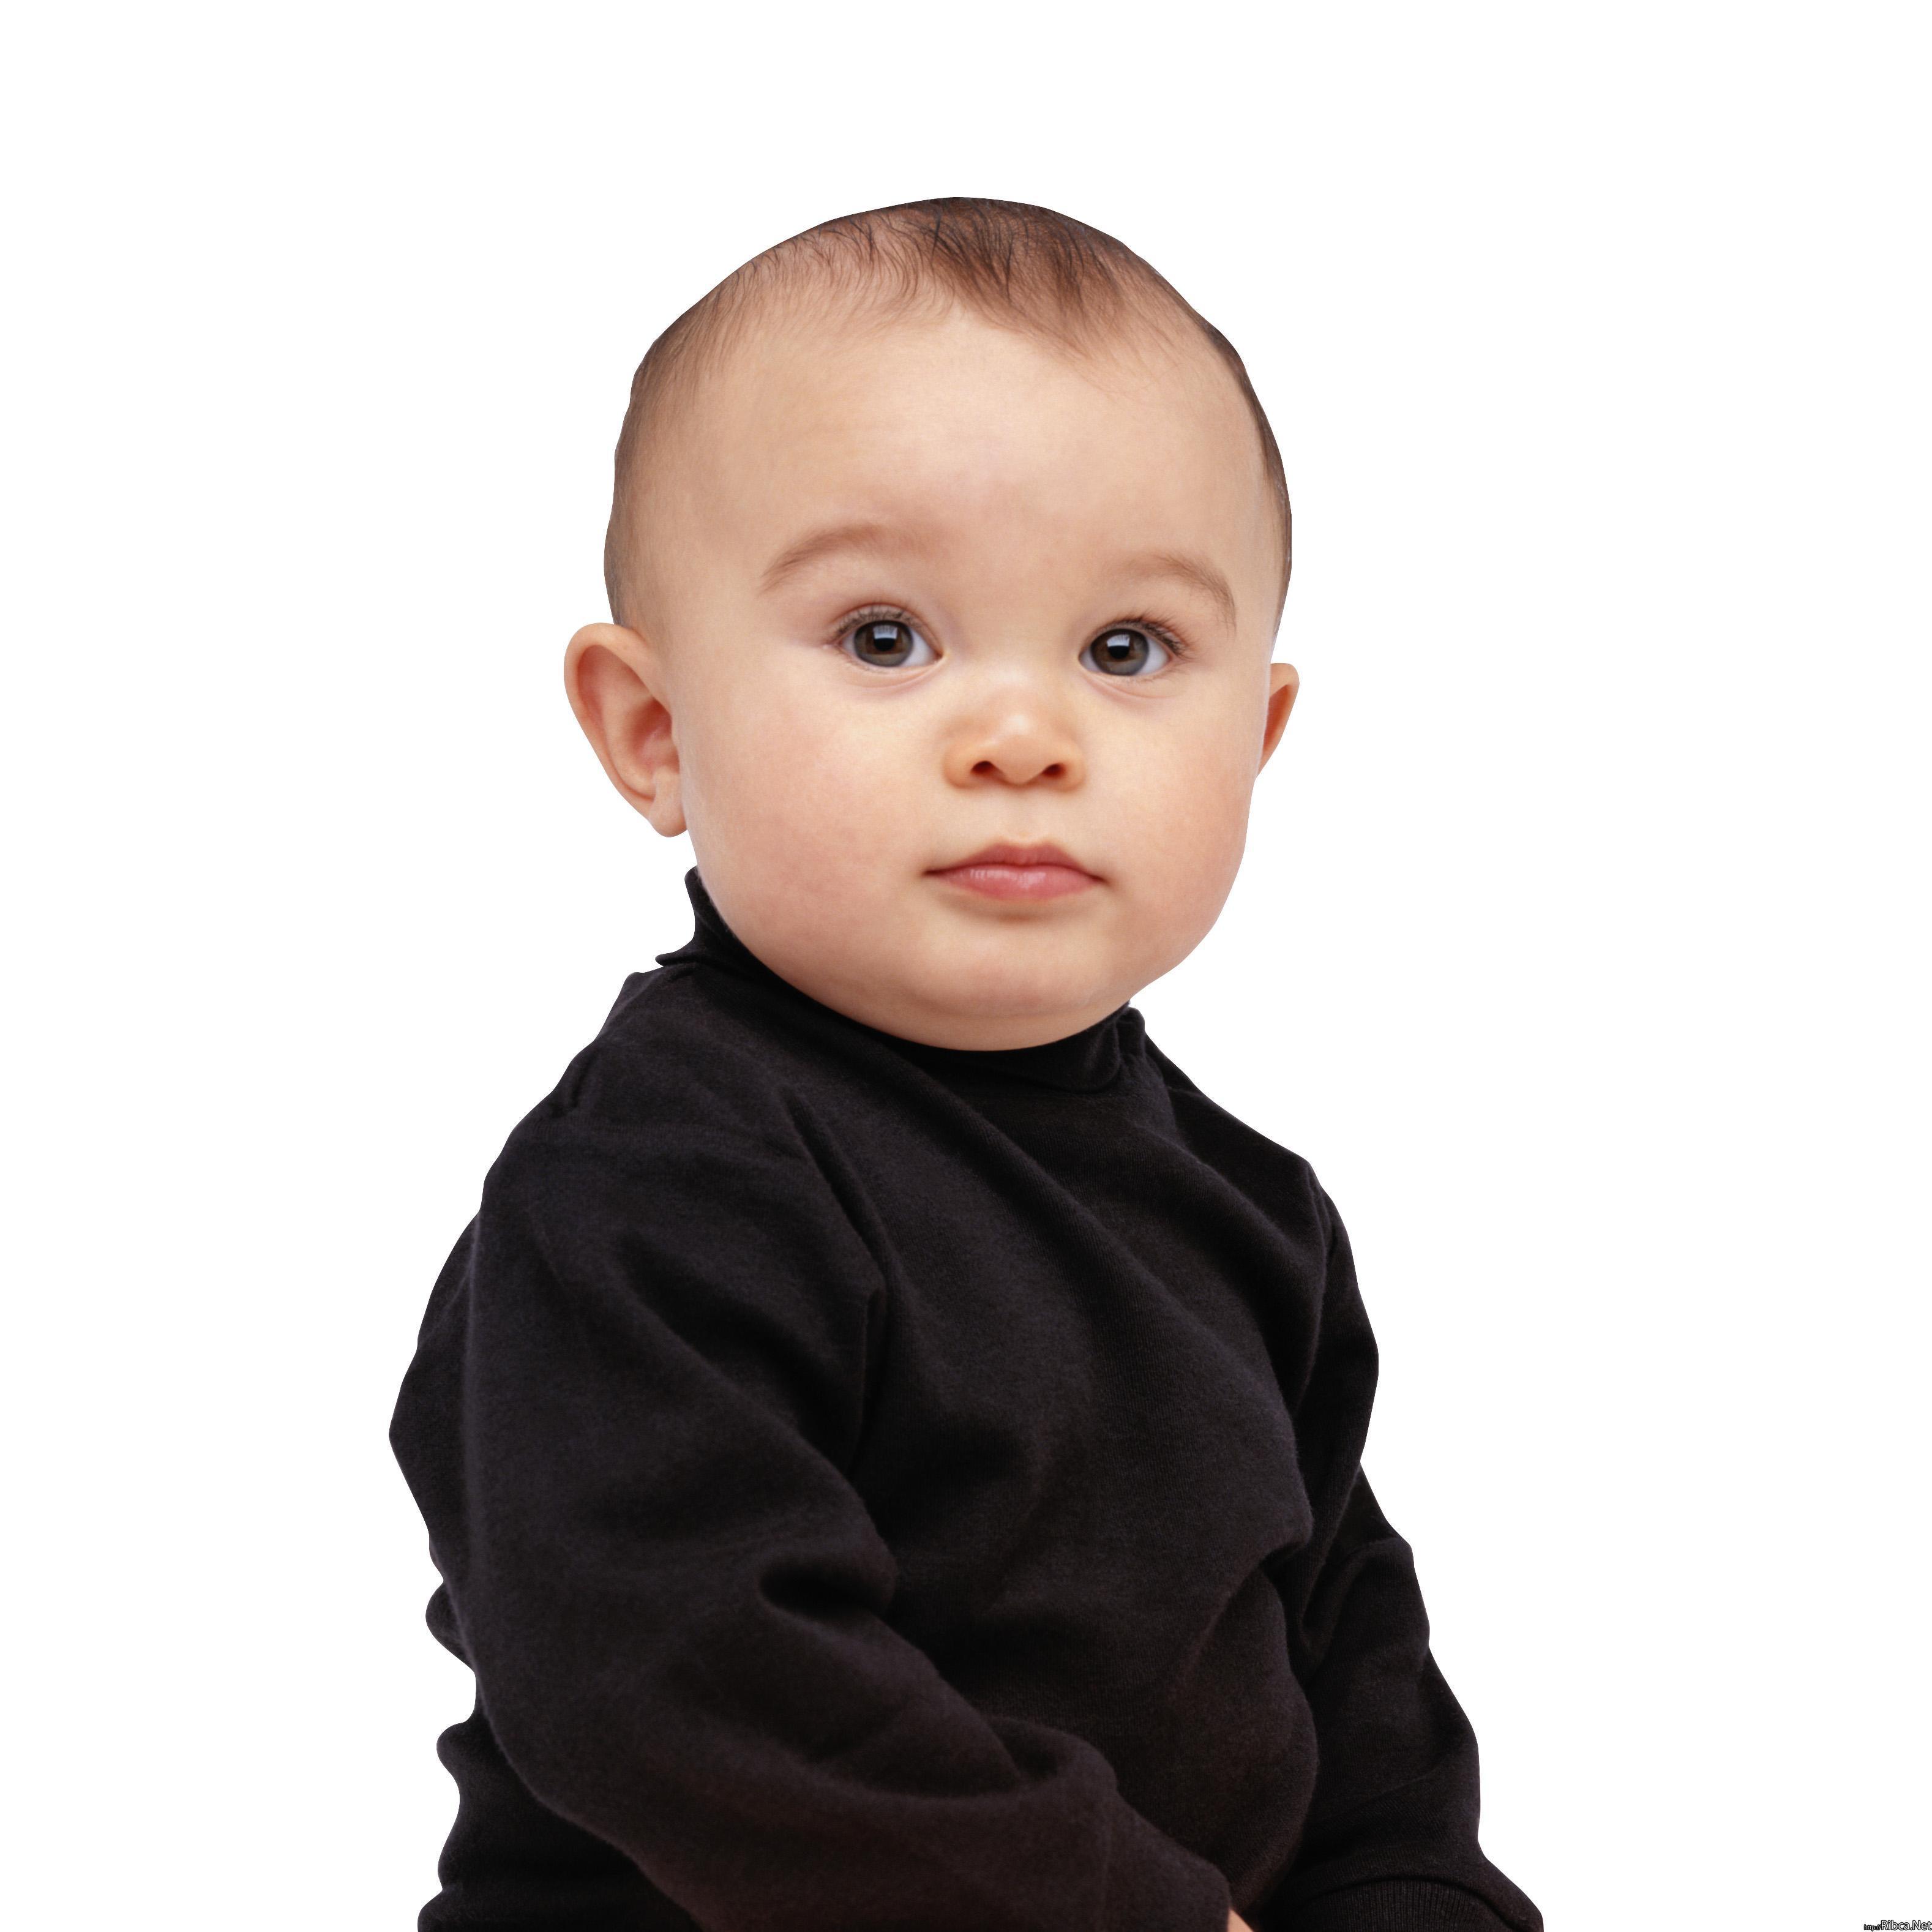 b Скачать/b картинки b маленьких/b детей.